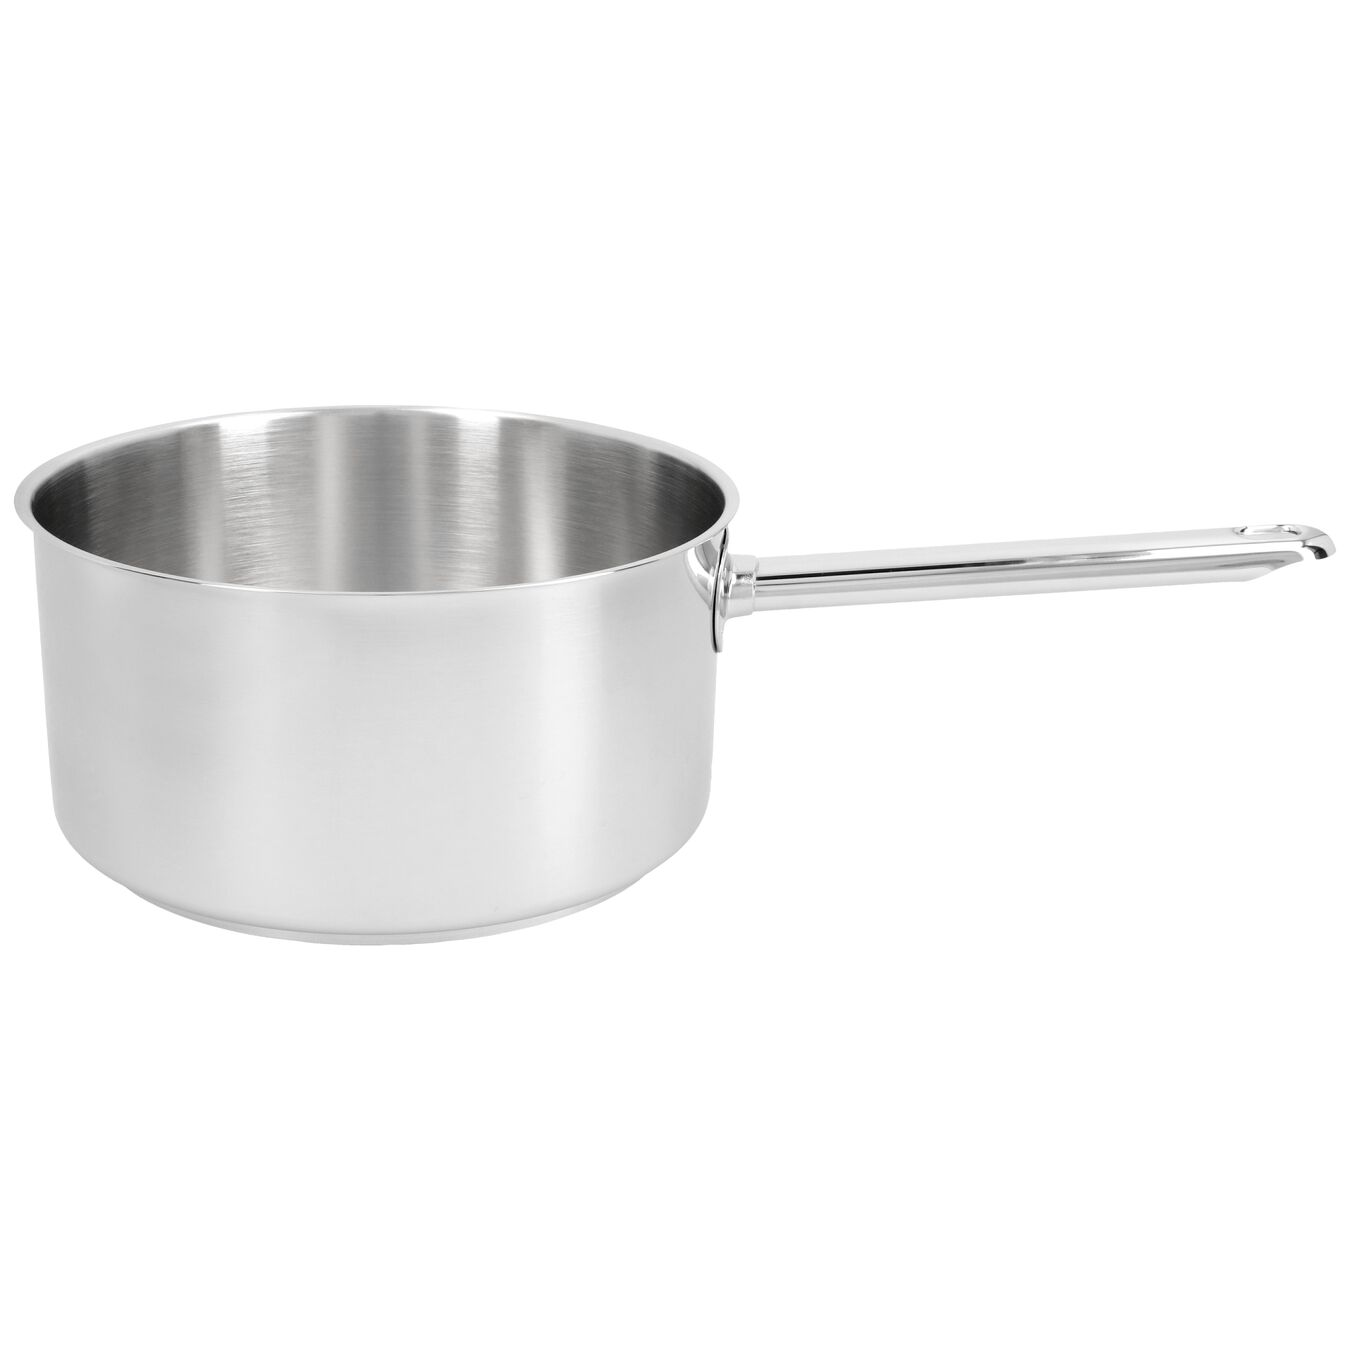 Steelpan zonder deksel 20 cm / 3 l,,large 1